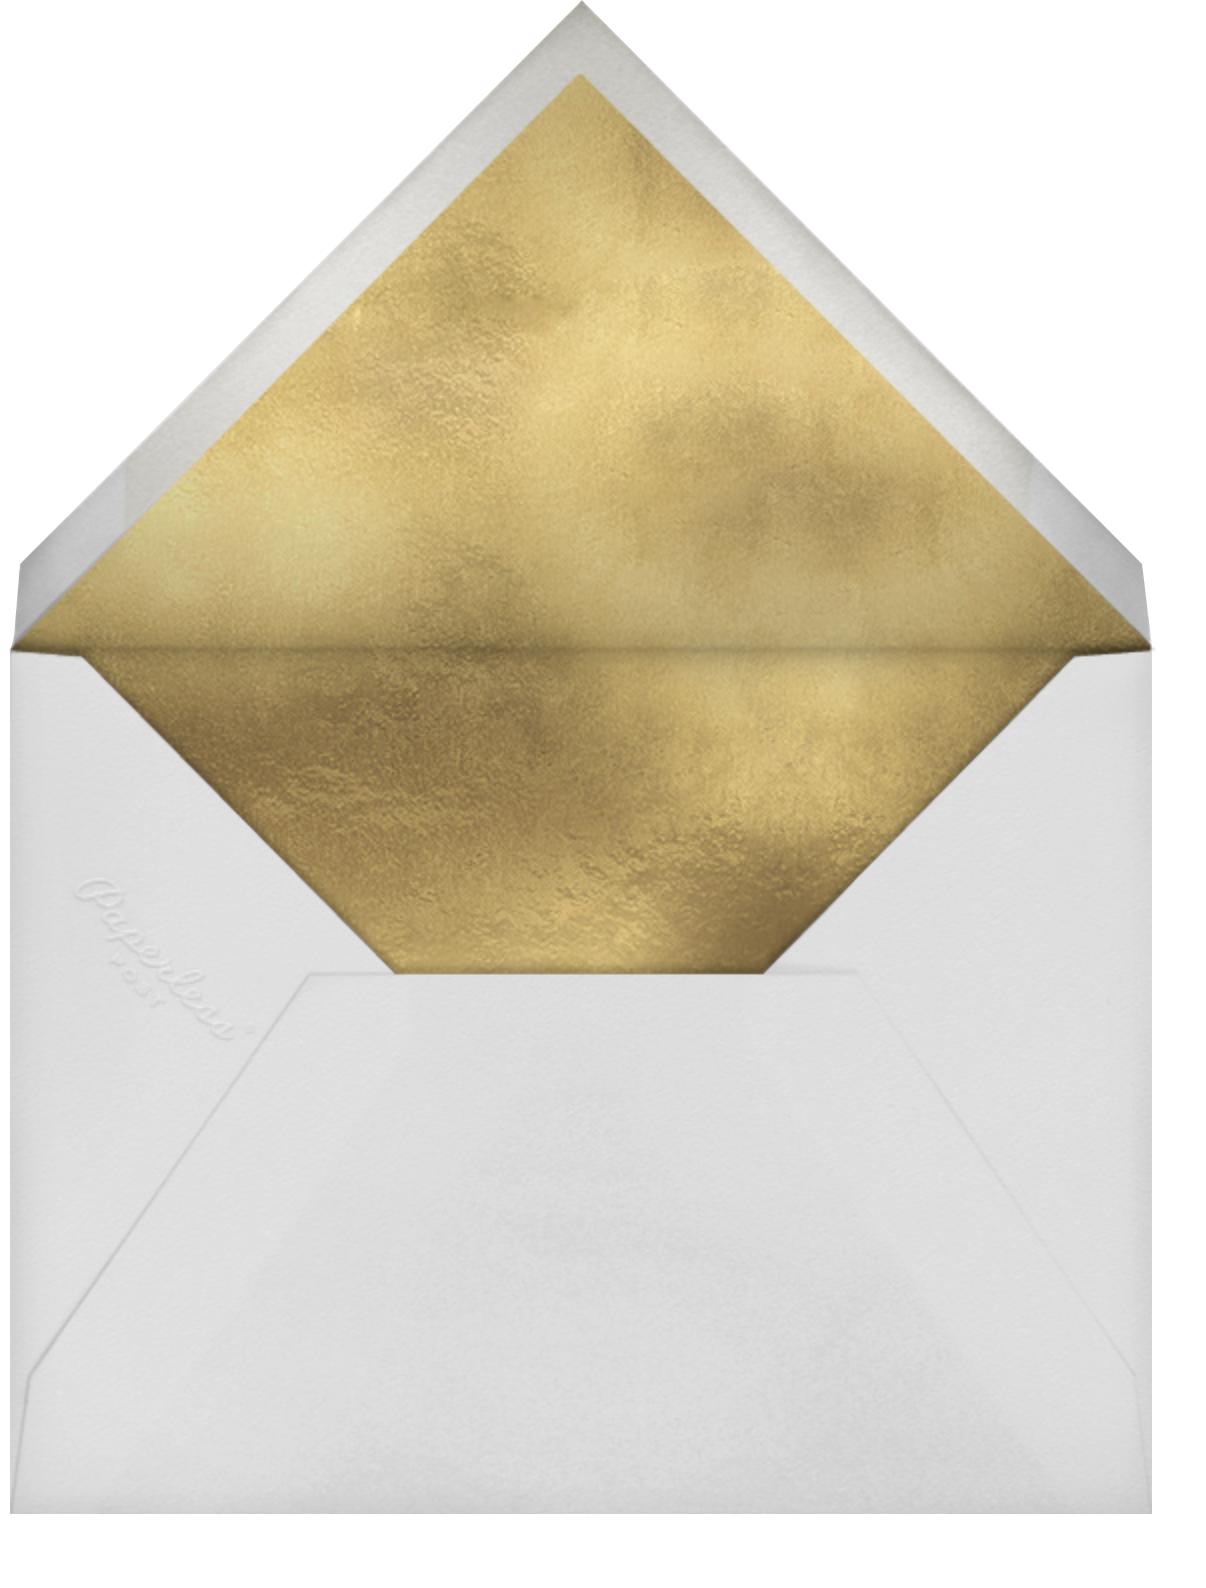 Better Daisies (Invitation) - Meringue - Mr. Boddington's Studio - Envelope